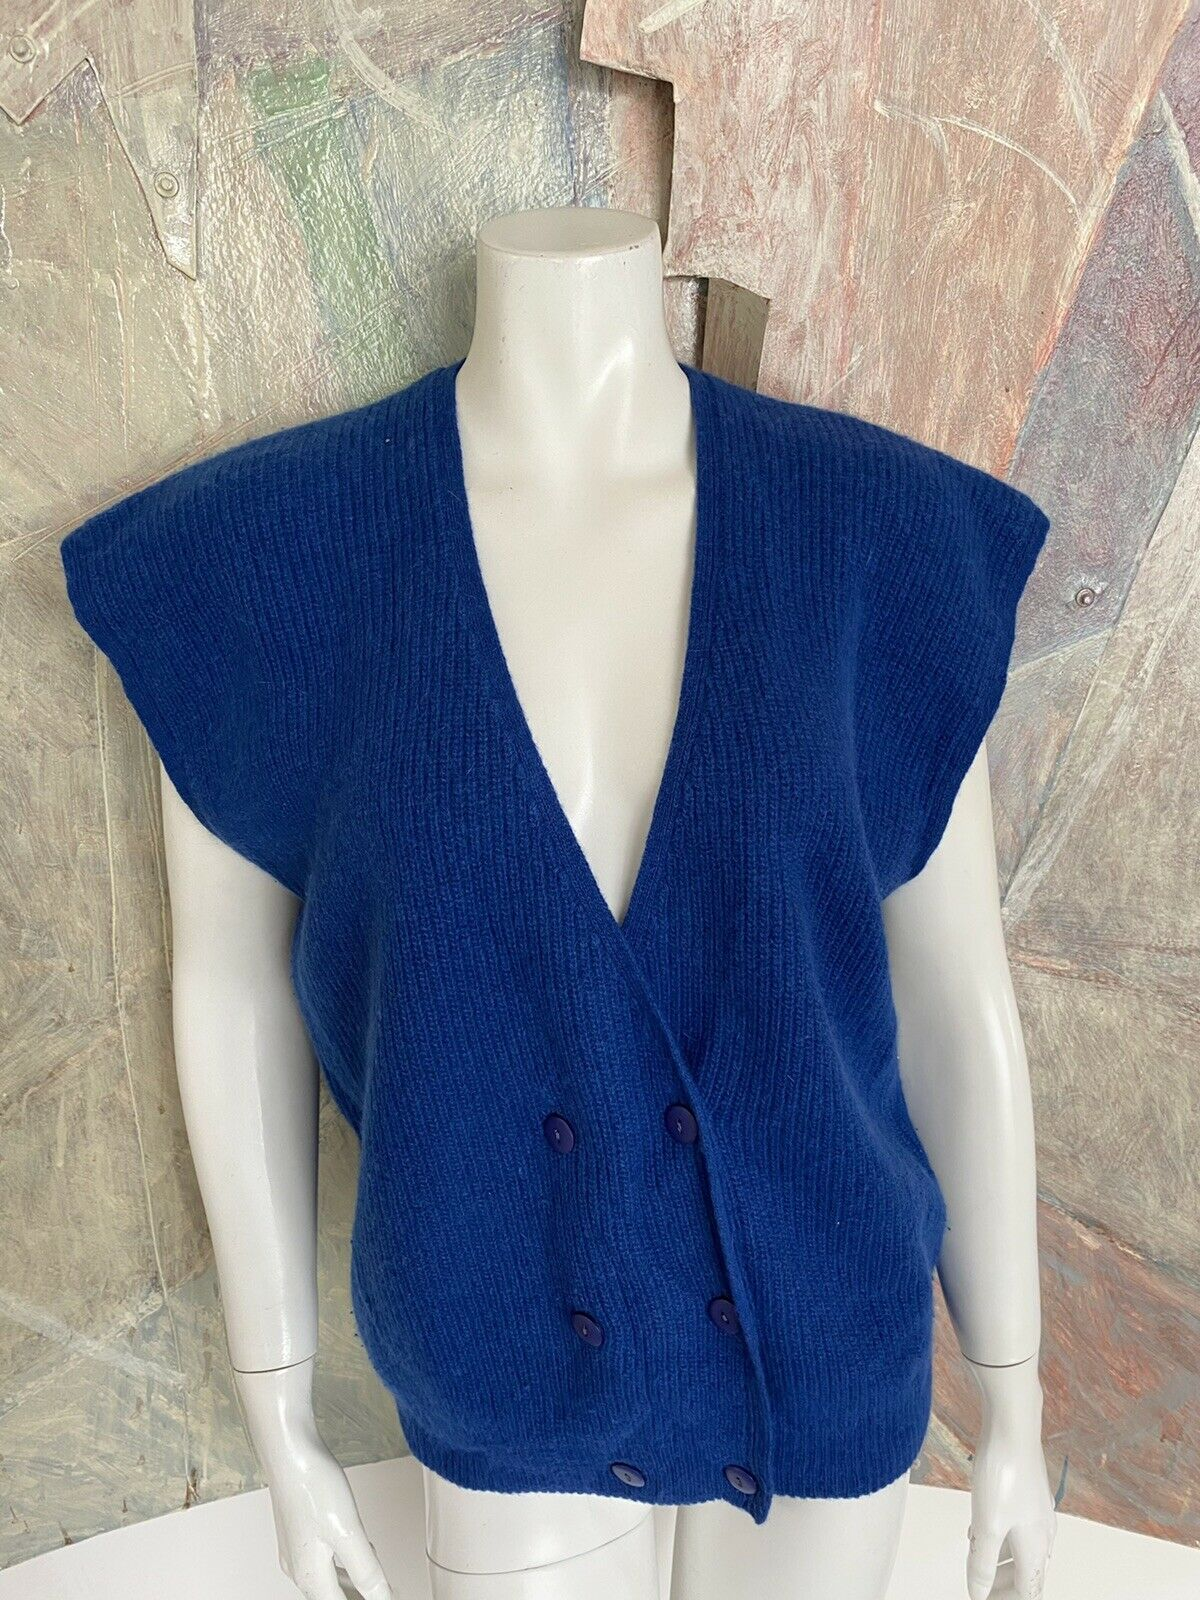 Vintage richard & Co. royal blue angora wool sweater cardigan vest size-show original title